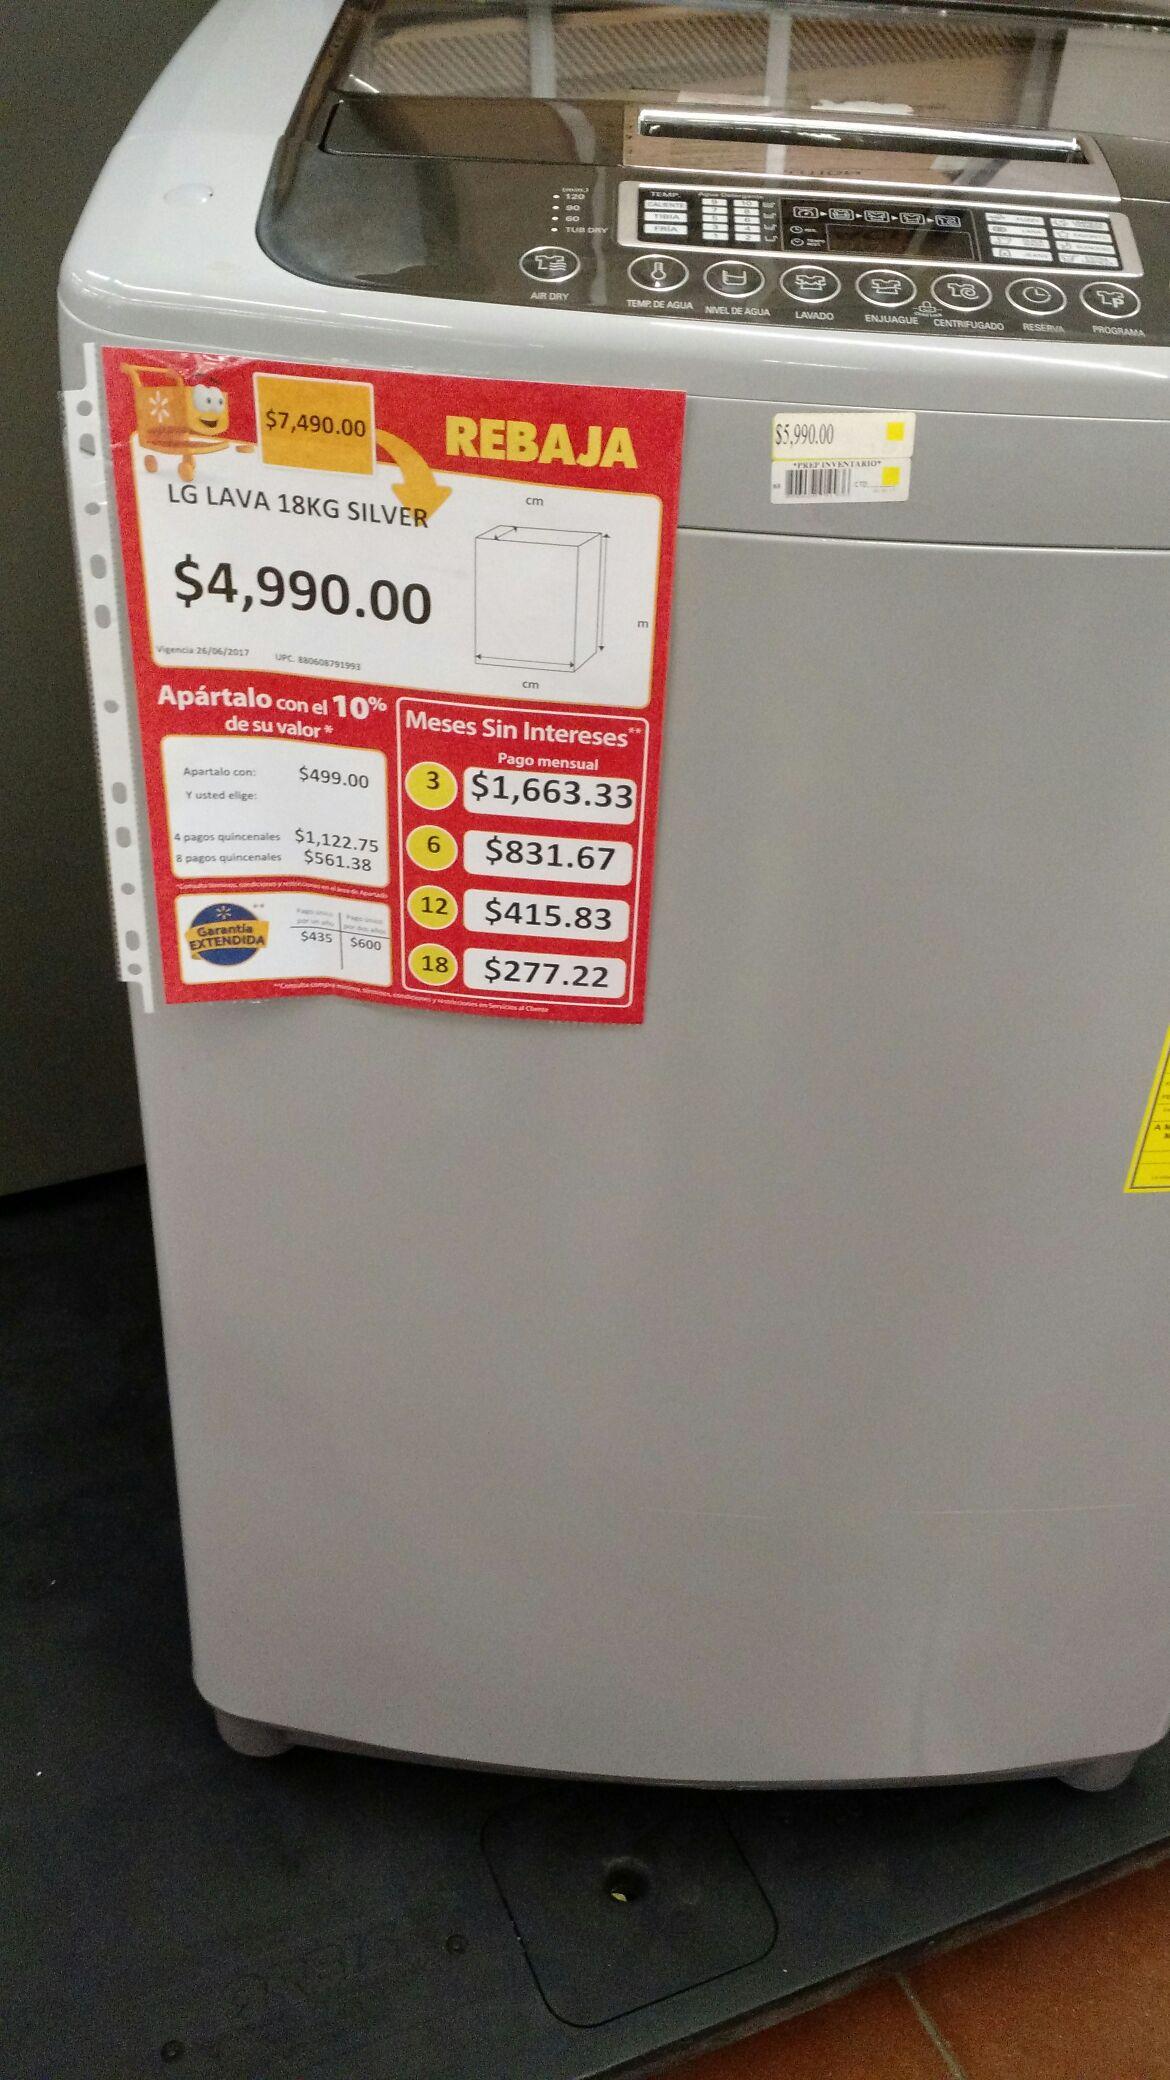 Walmart: Lavadora LG Turbo Drum 18kg a $4,990